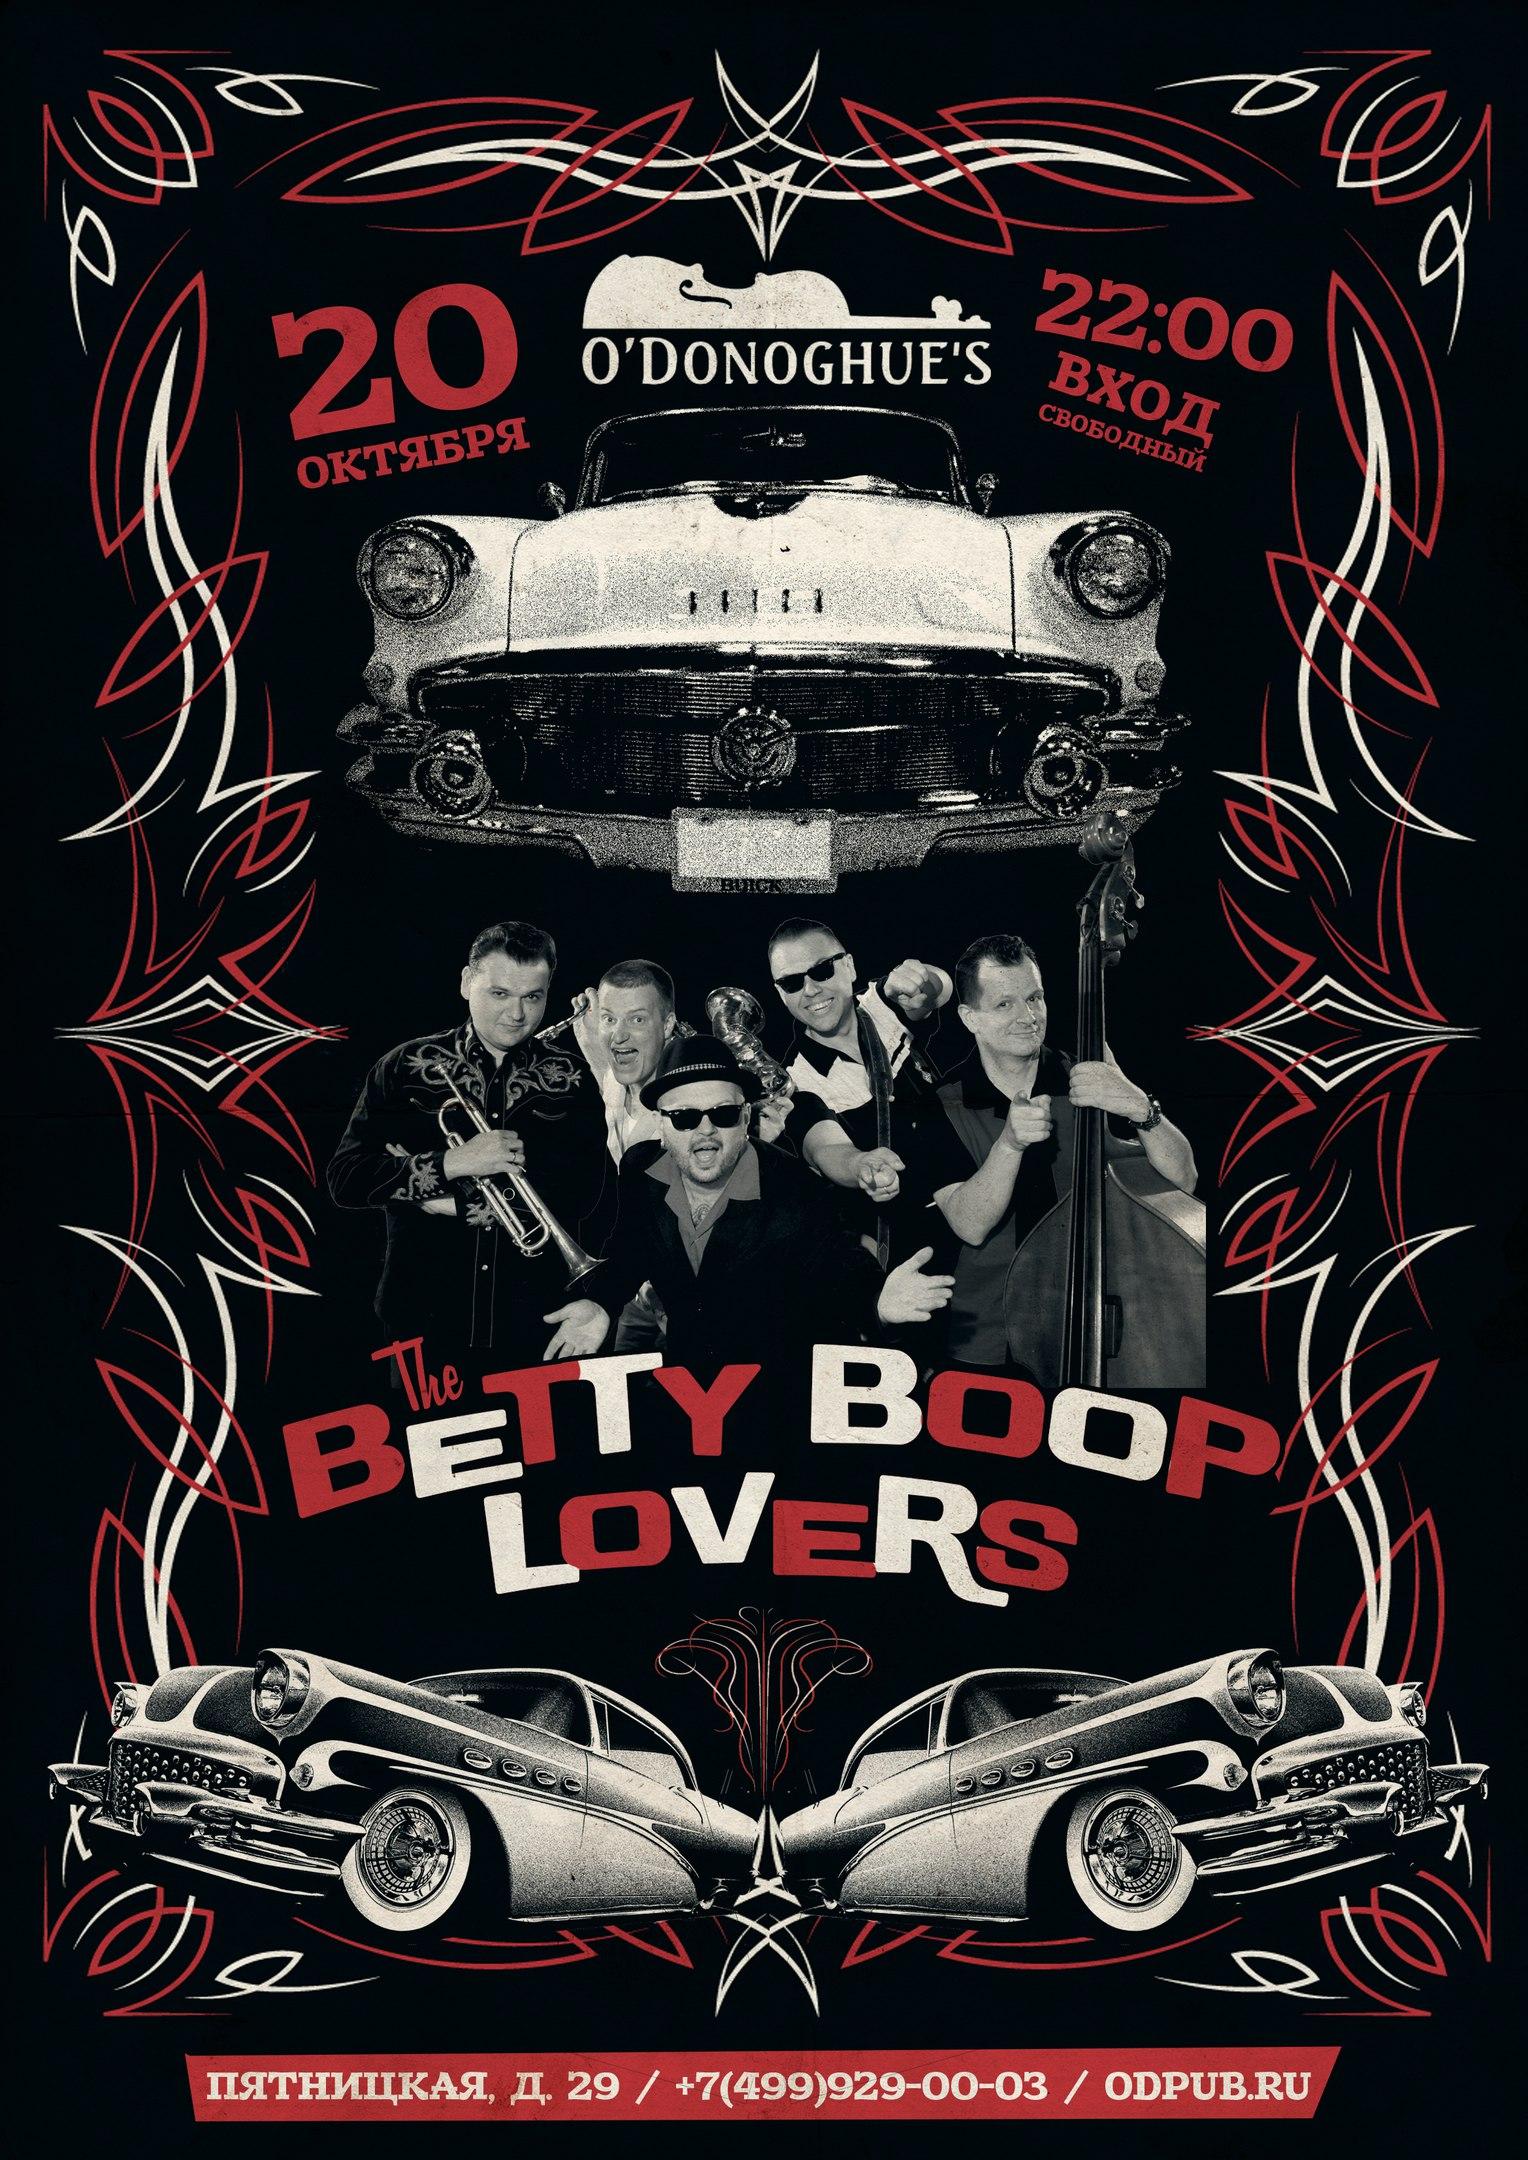 20.10 The Betty Boop Lovers в O'Donoghues Pub!